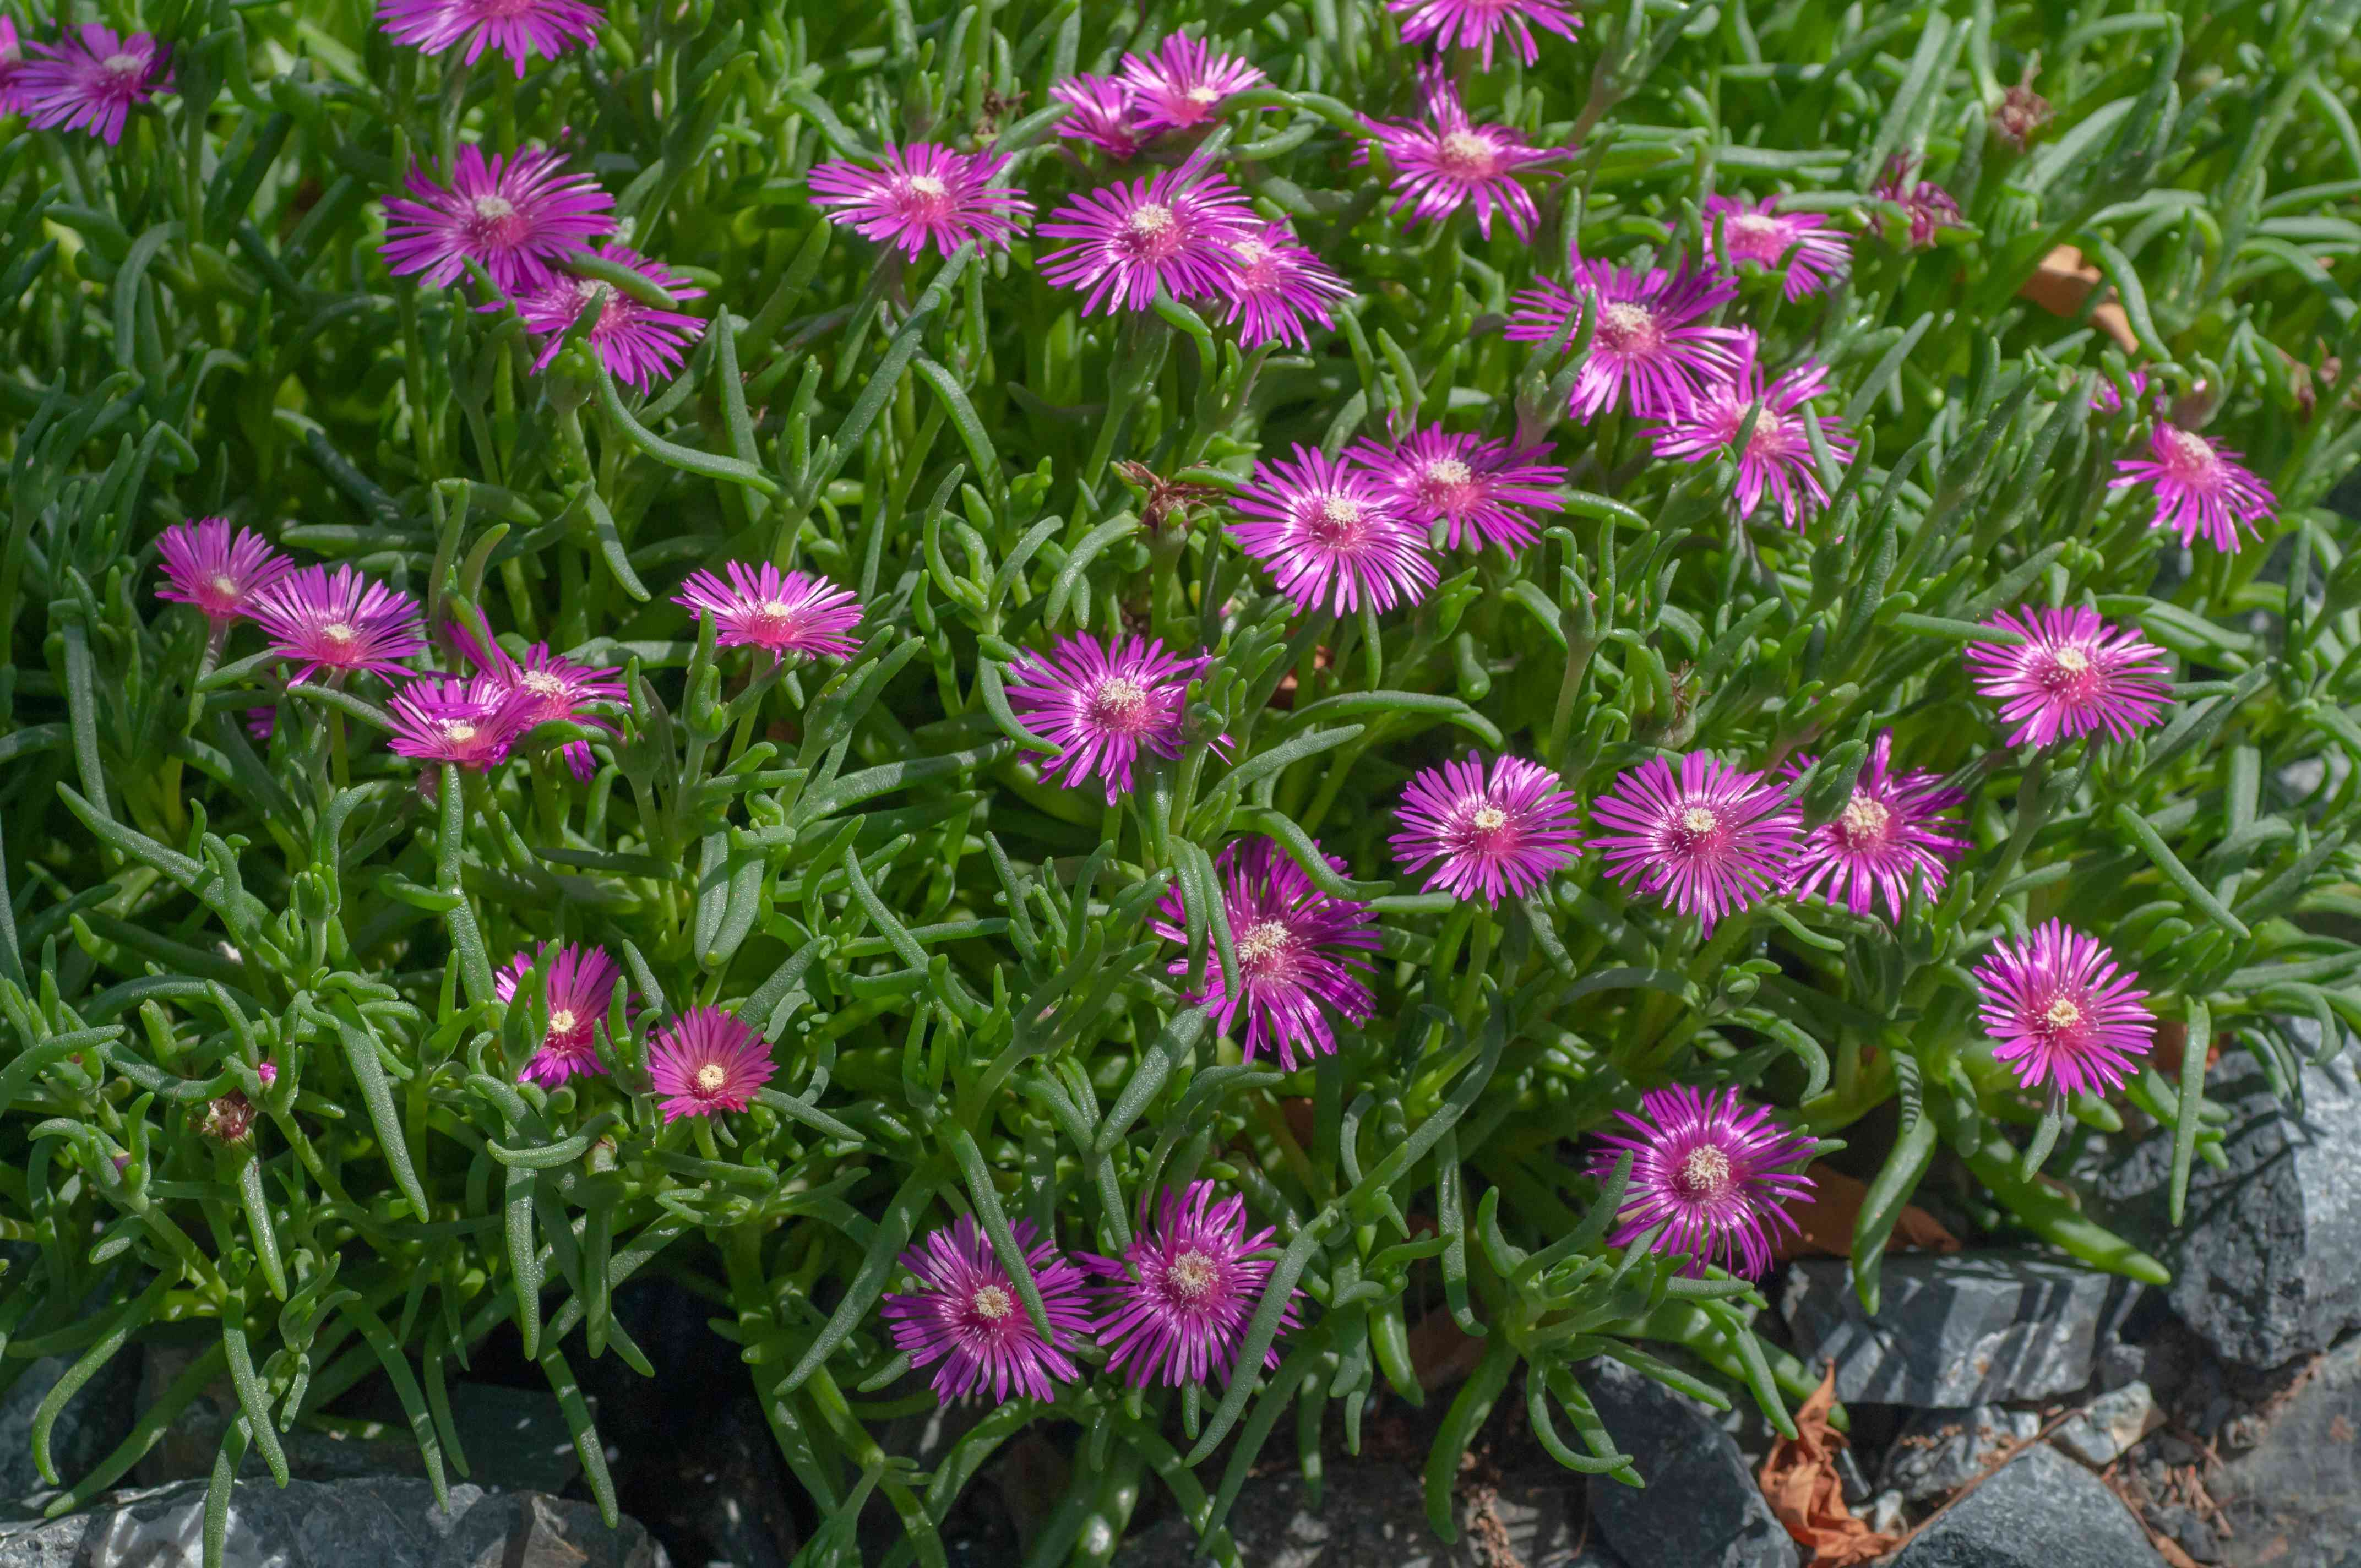 purple ice plant in a garden